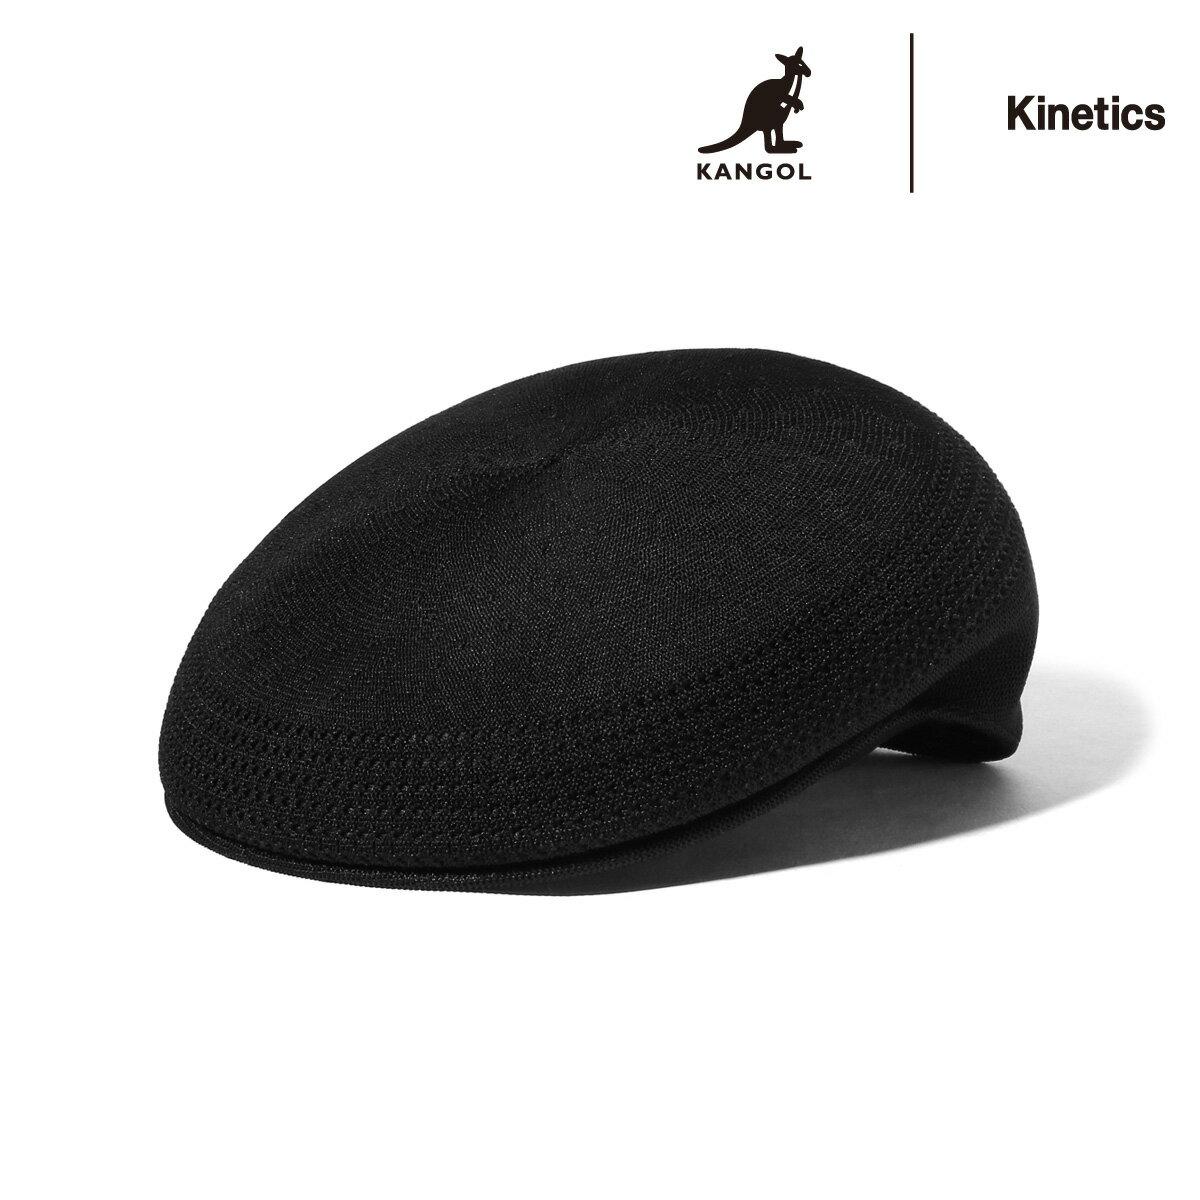 KANGOL × Kinetics Tropic 504 (Black) 【帽子】【18FW-S】